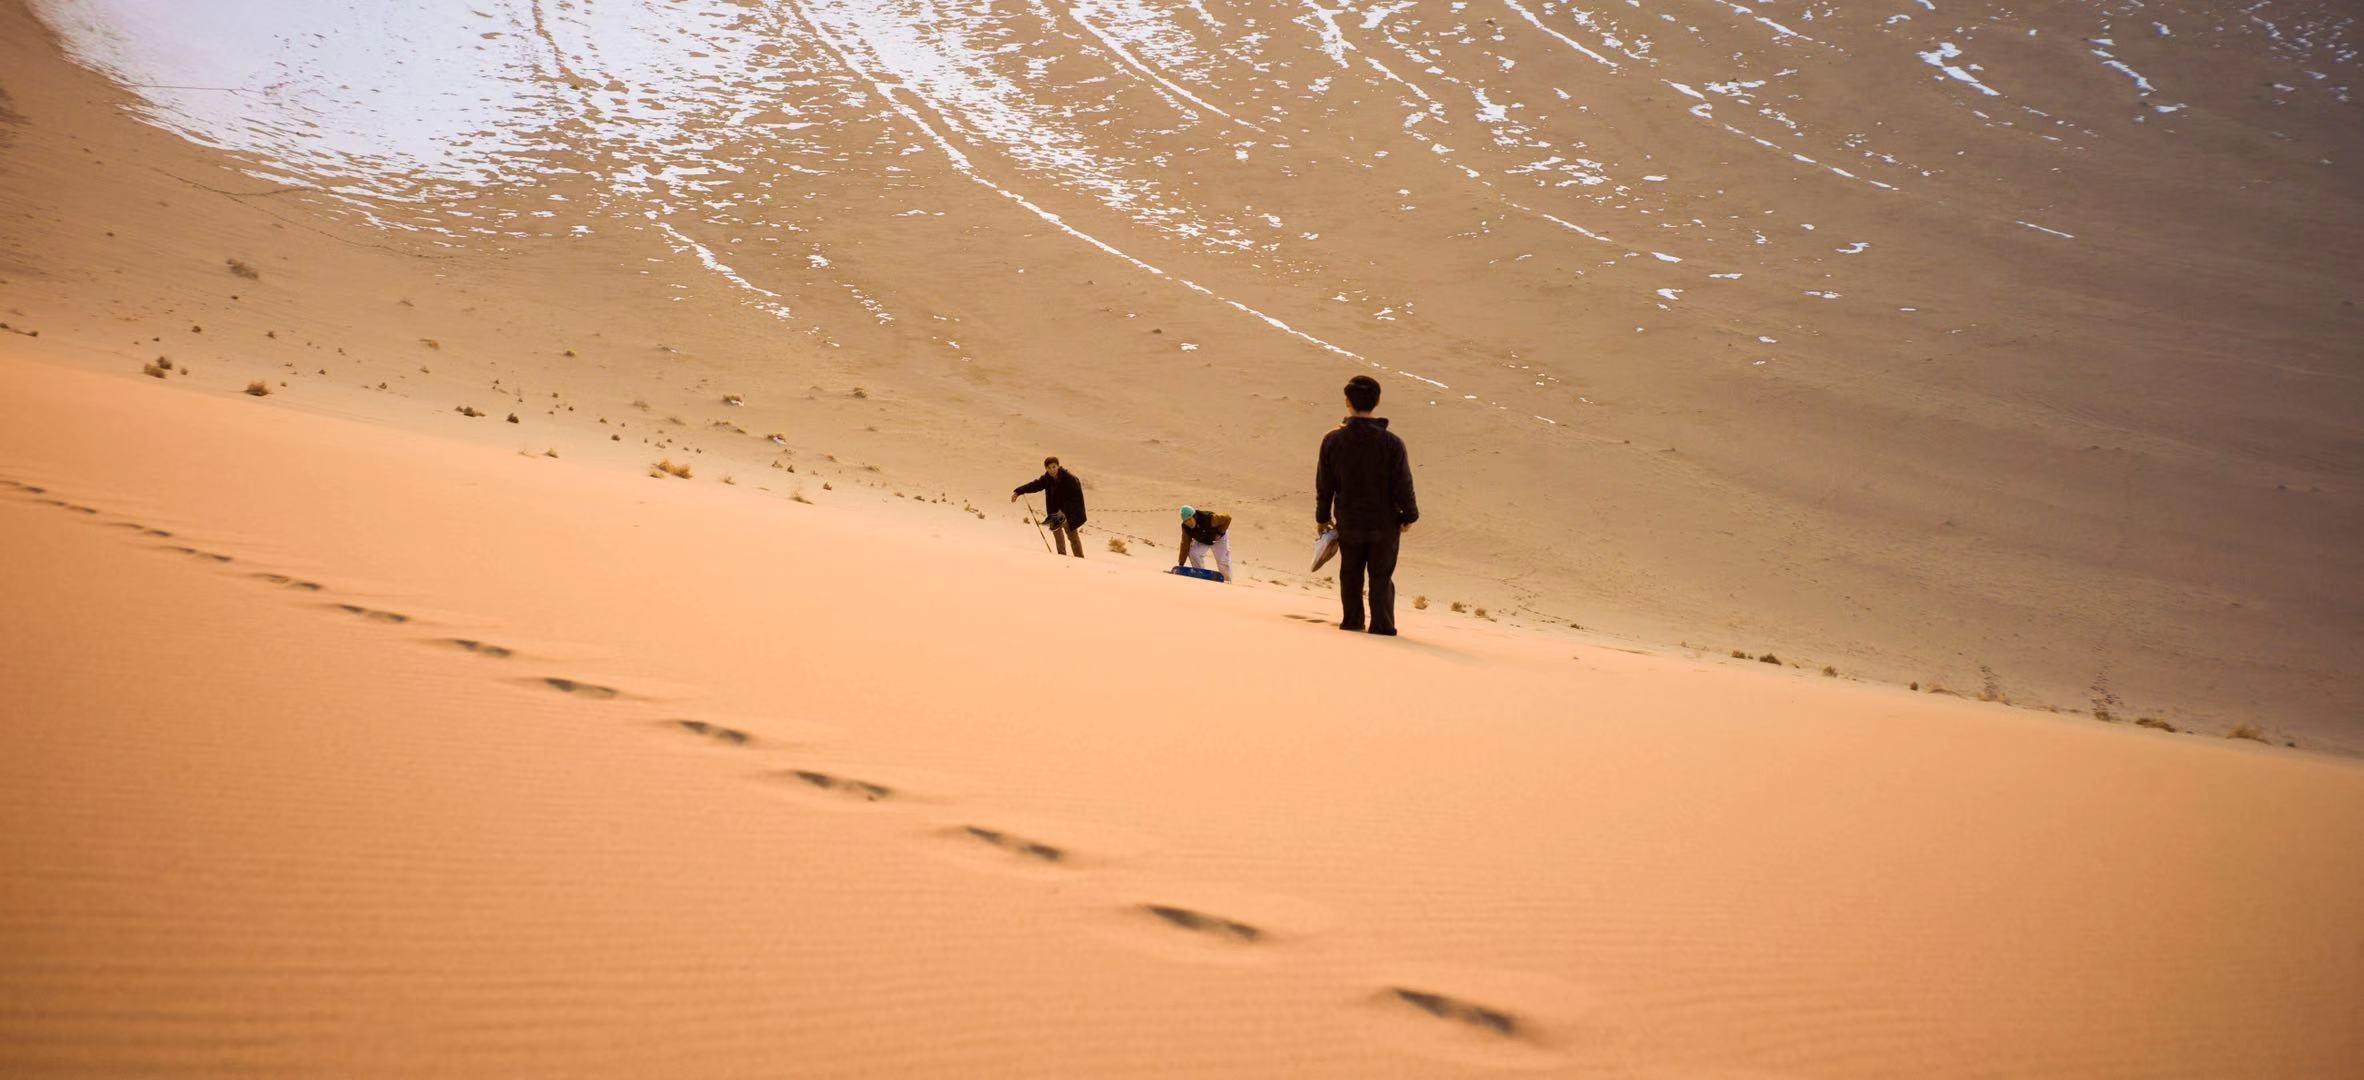 board-sand-dune.JPG